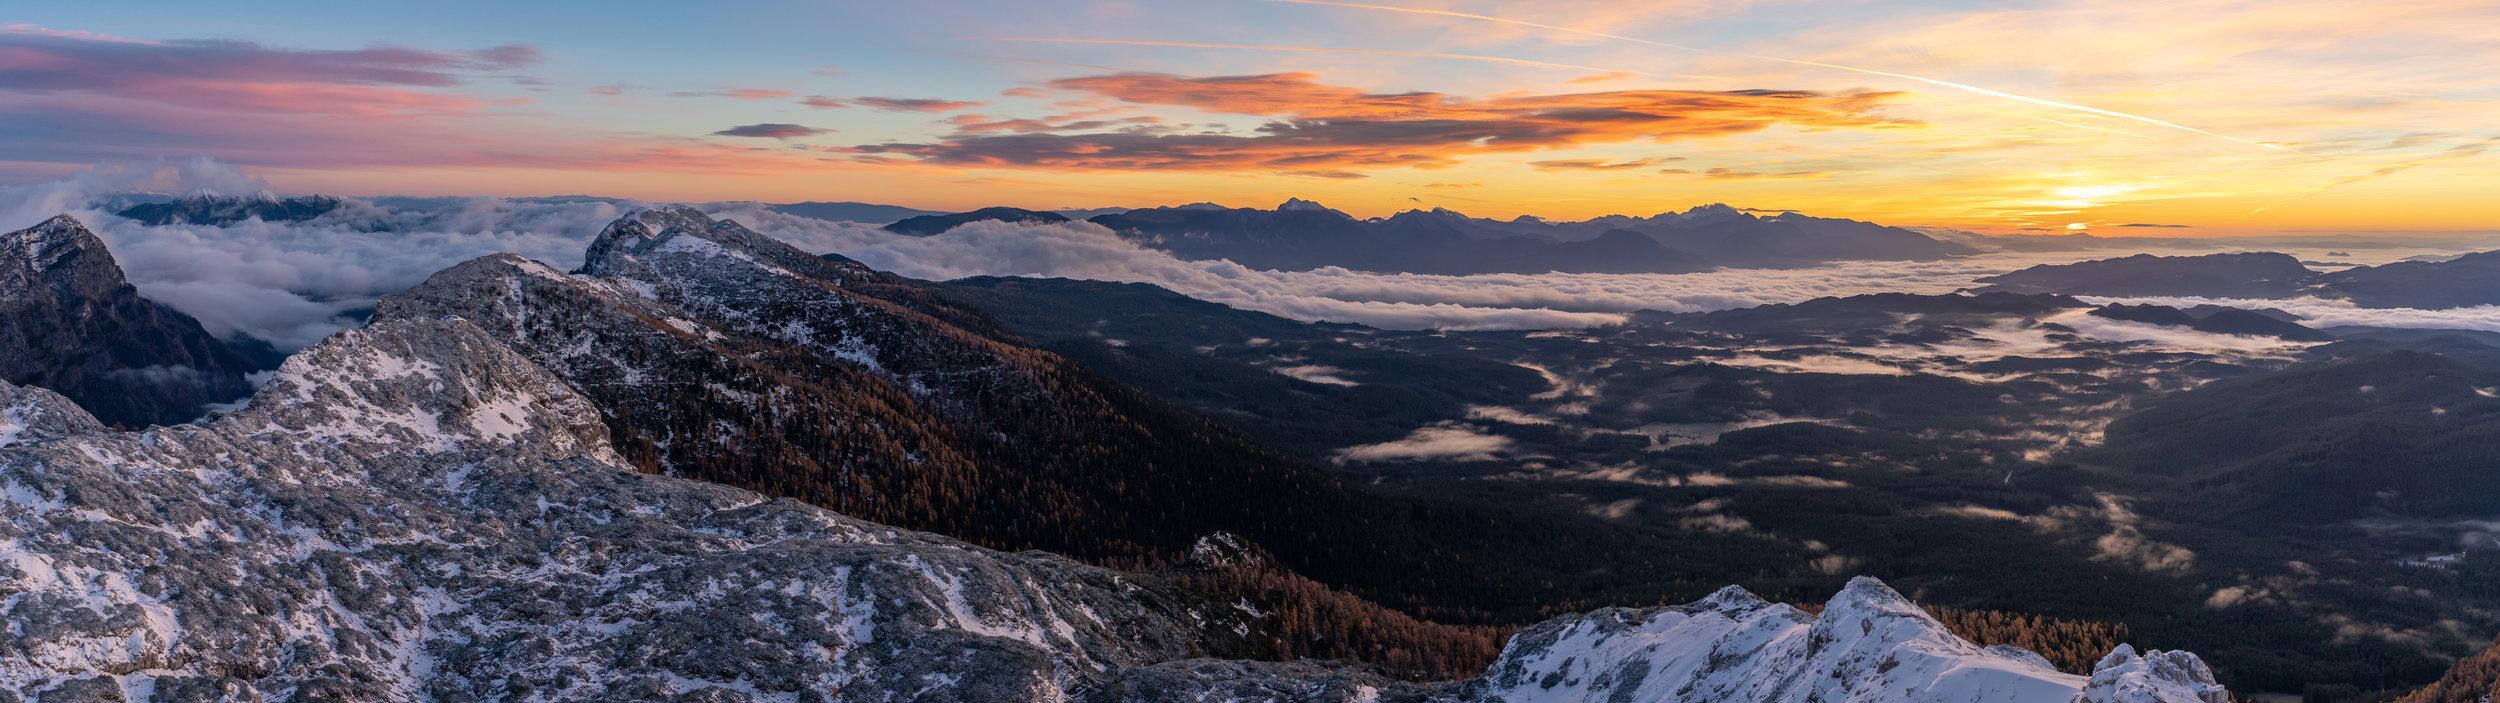 Panoramic view from Mt. Viševnik (2050 m) towards the forests of Pokljuka and the Kamnik-Savinja Alps.